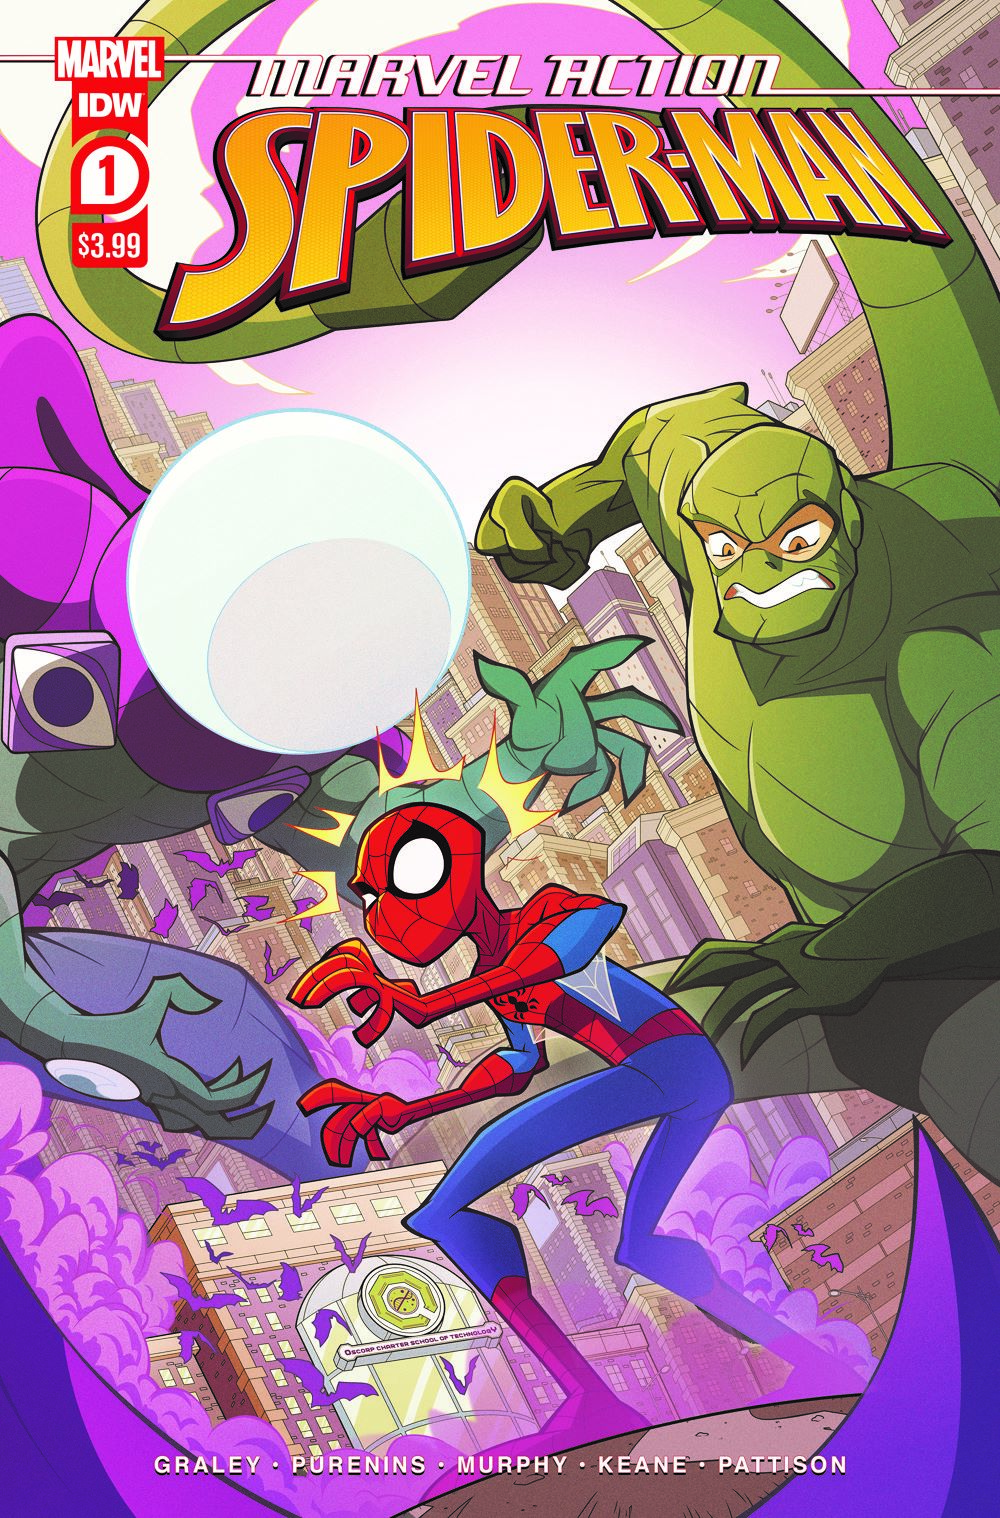 SpidermanV3-01_cvrA ComicList Previews: MARVEL ACTION SPIDER-MAN VOLUME 3 #1